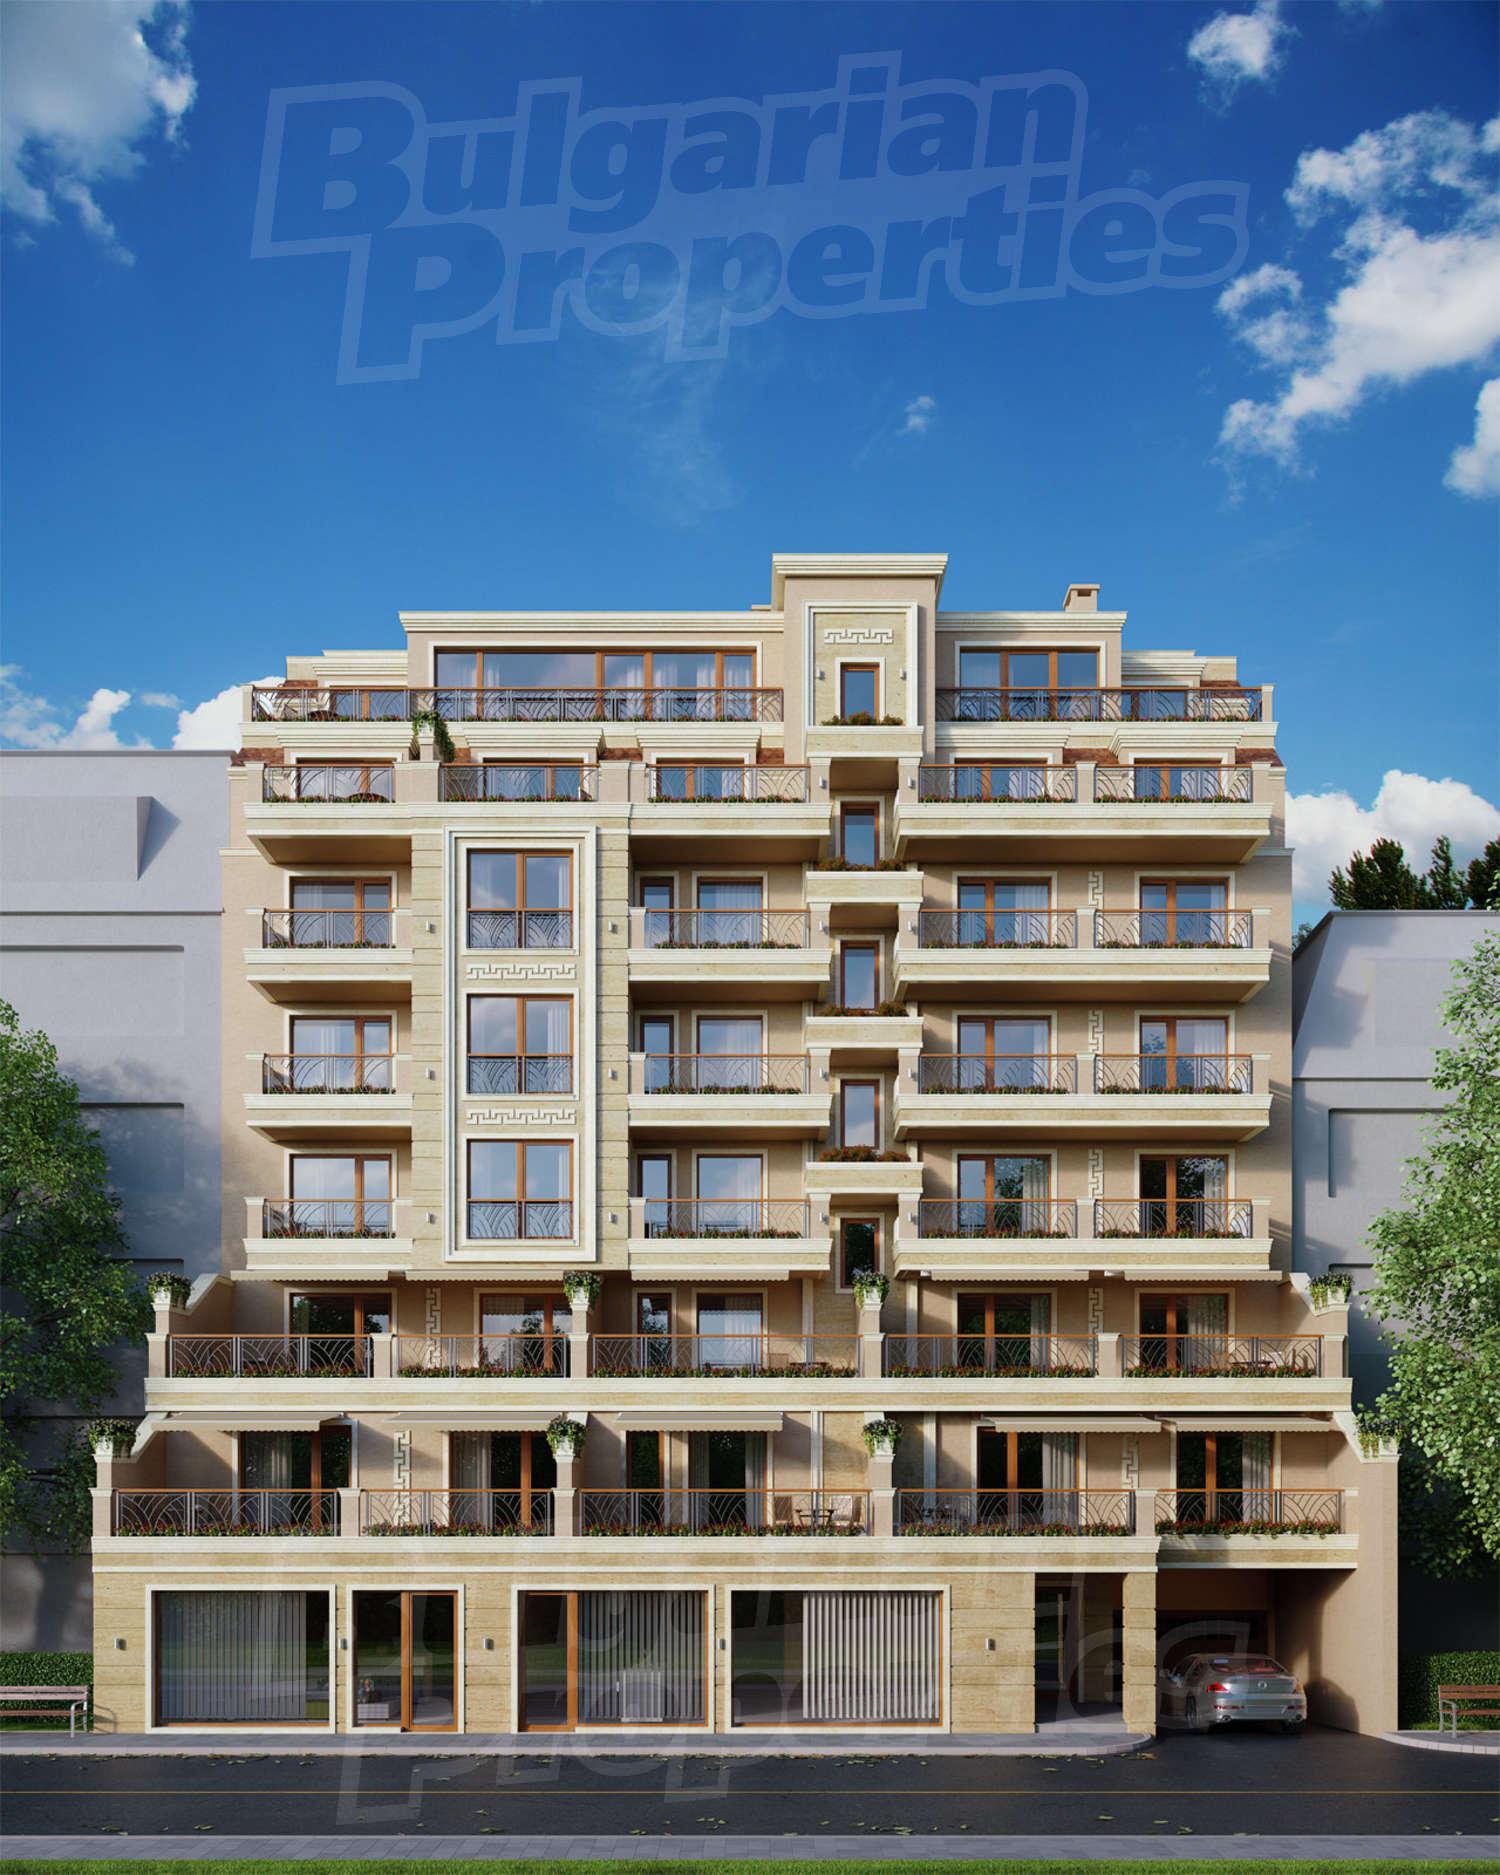 2 Bedroom Apartment For Sale In Sofia Quarterzona B 18 Do Ul Pirotska Bulgaria Two